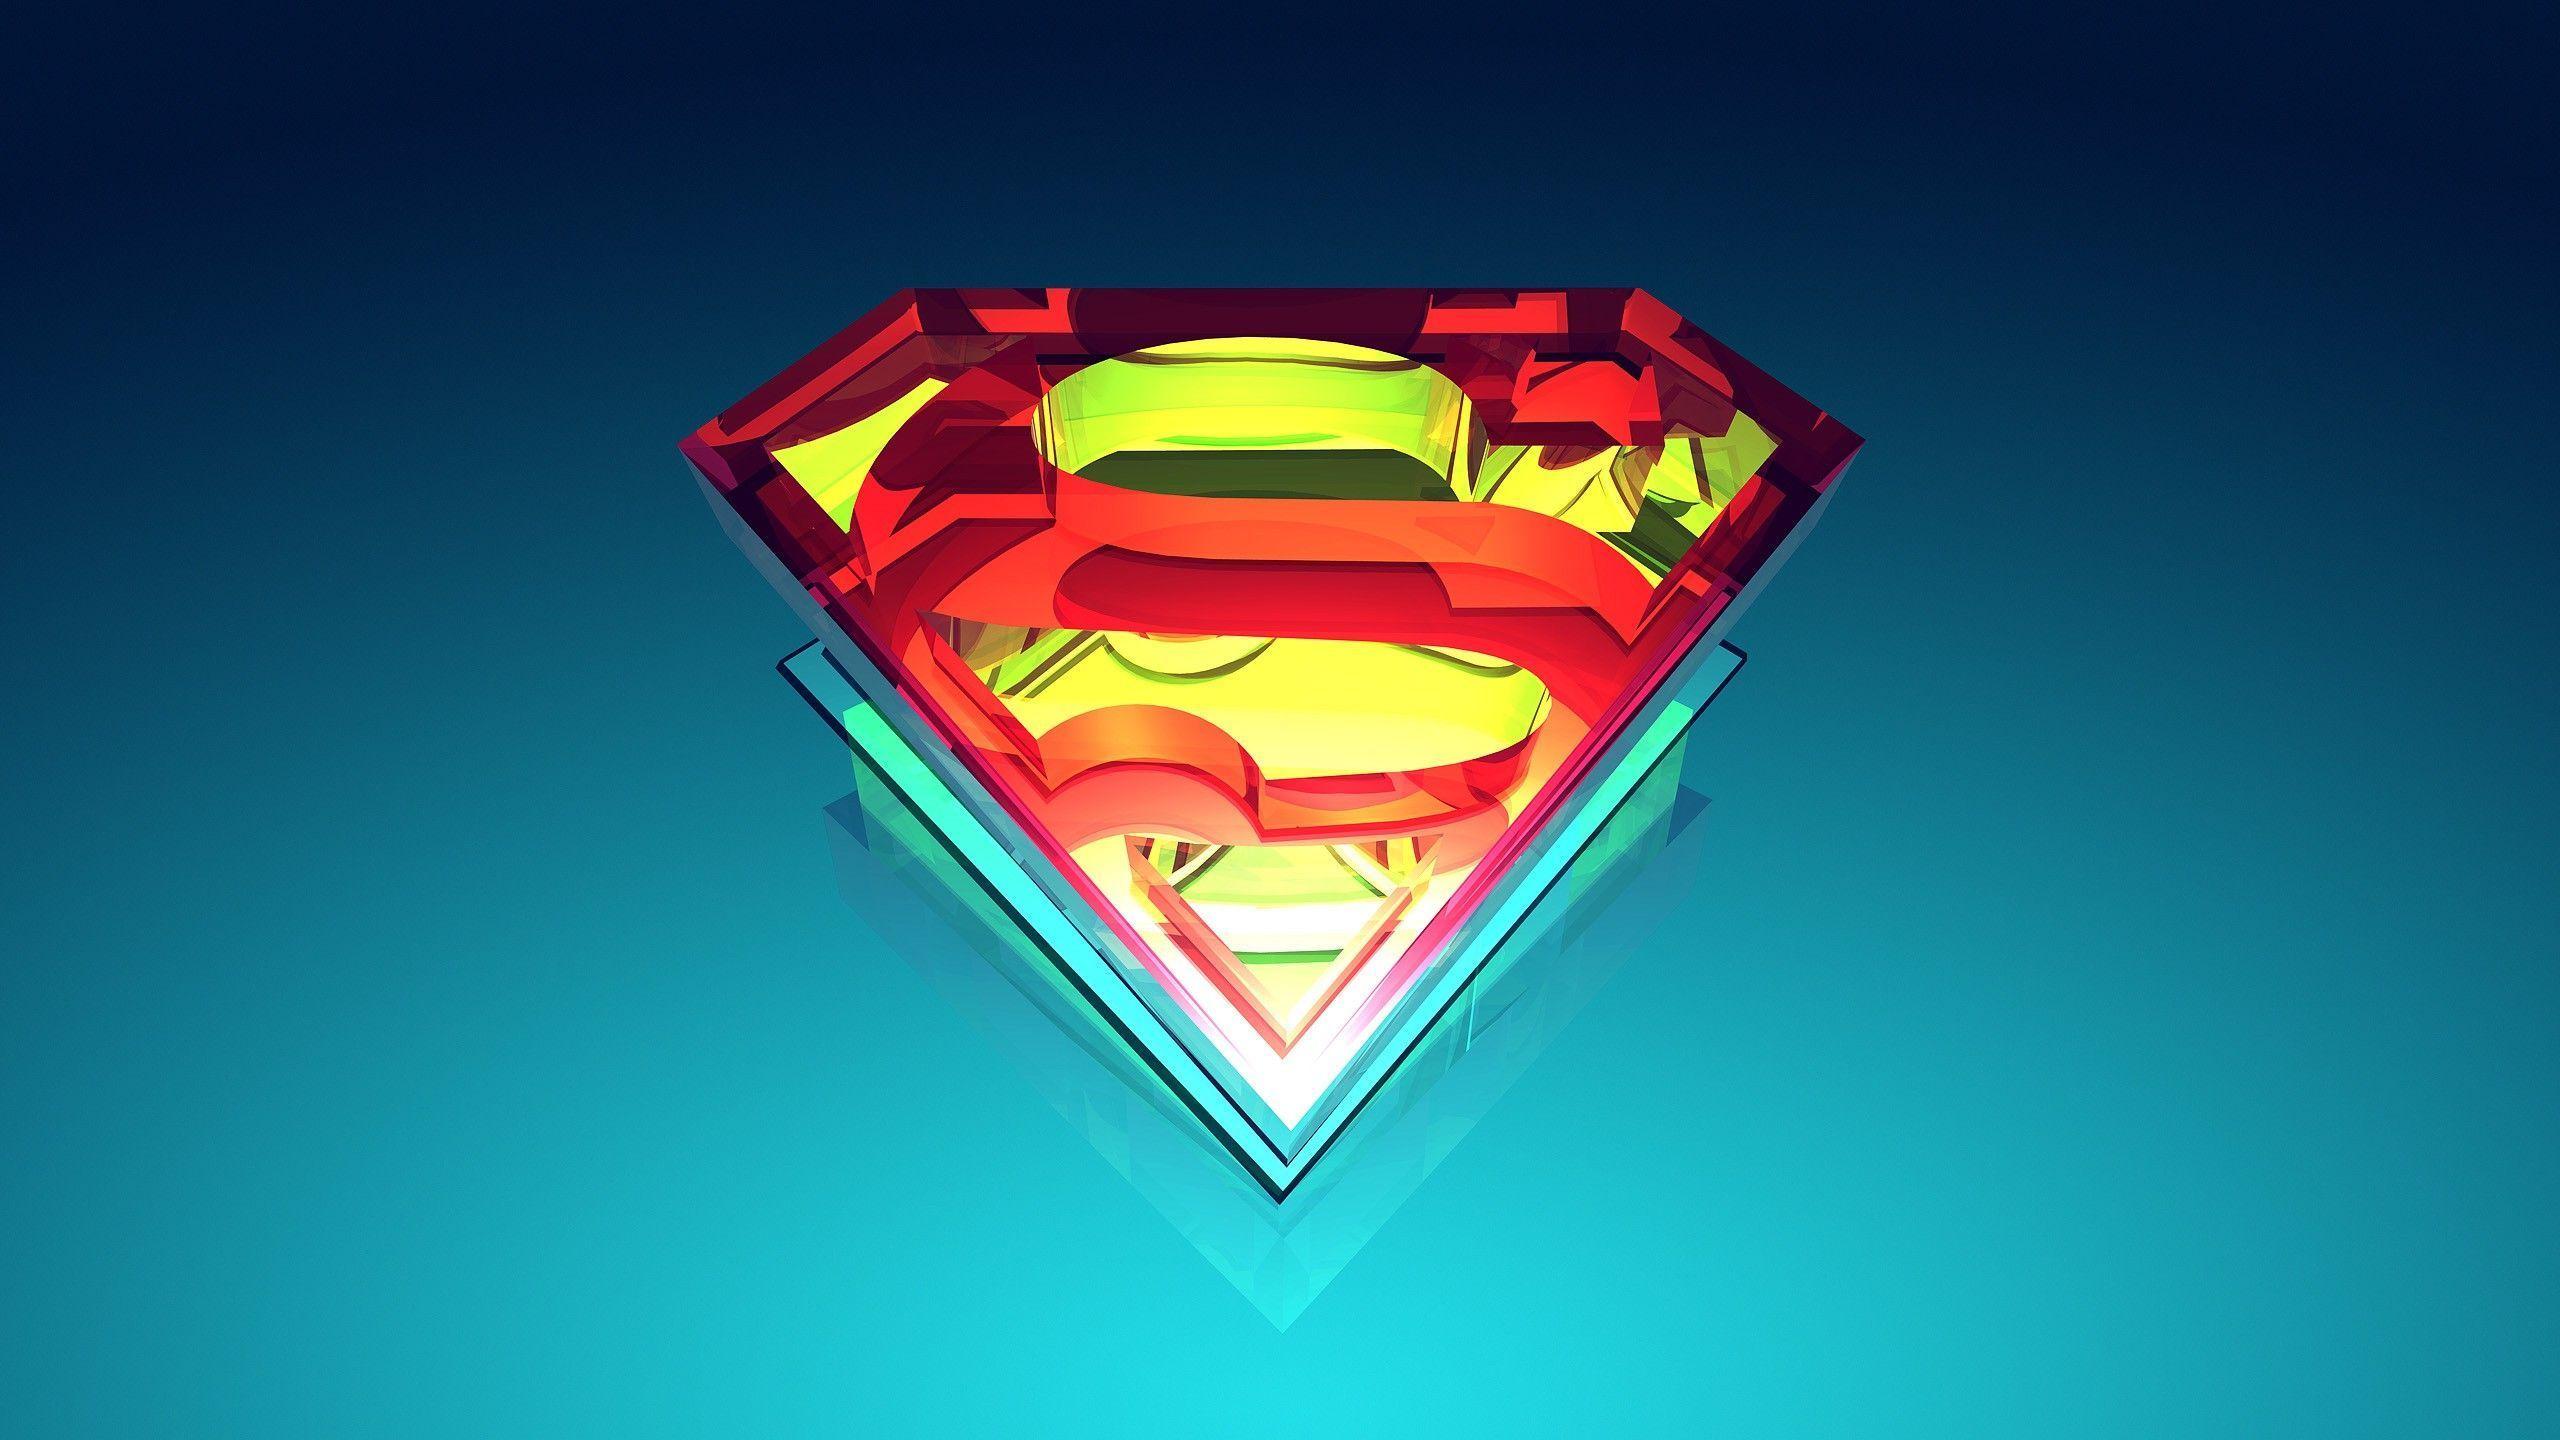 Abstract-superman-logo-wallpaper-desktop-images-download ...